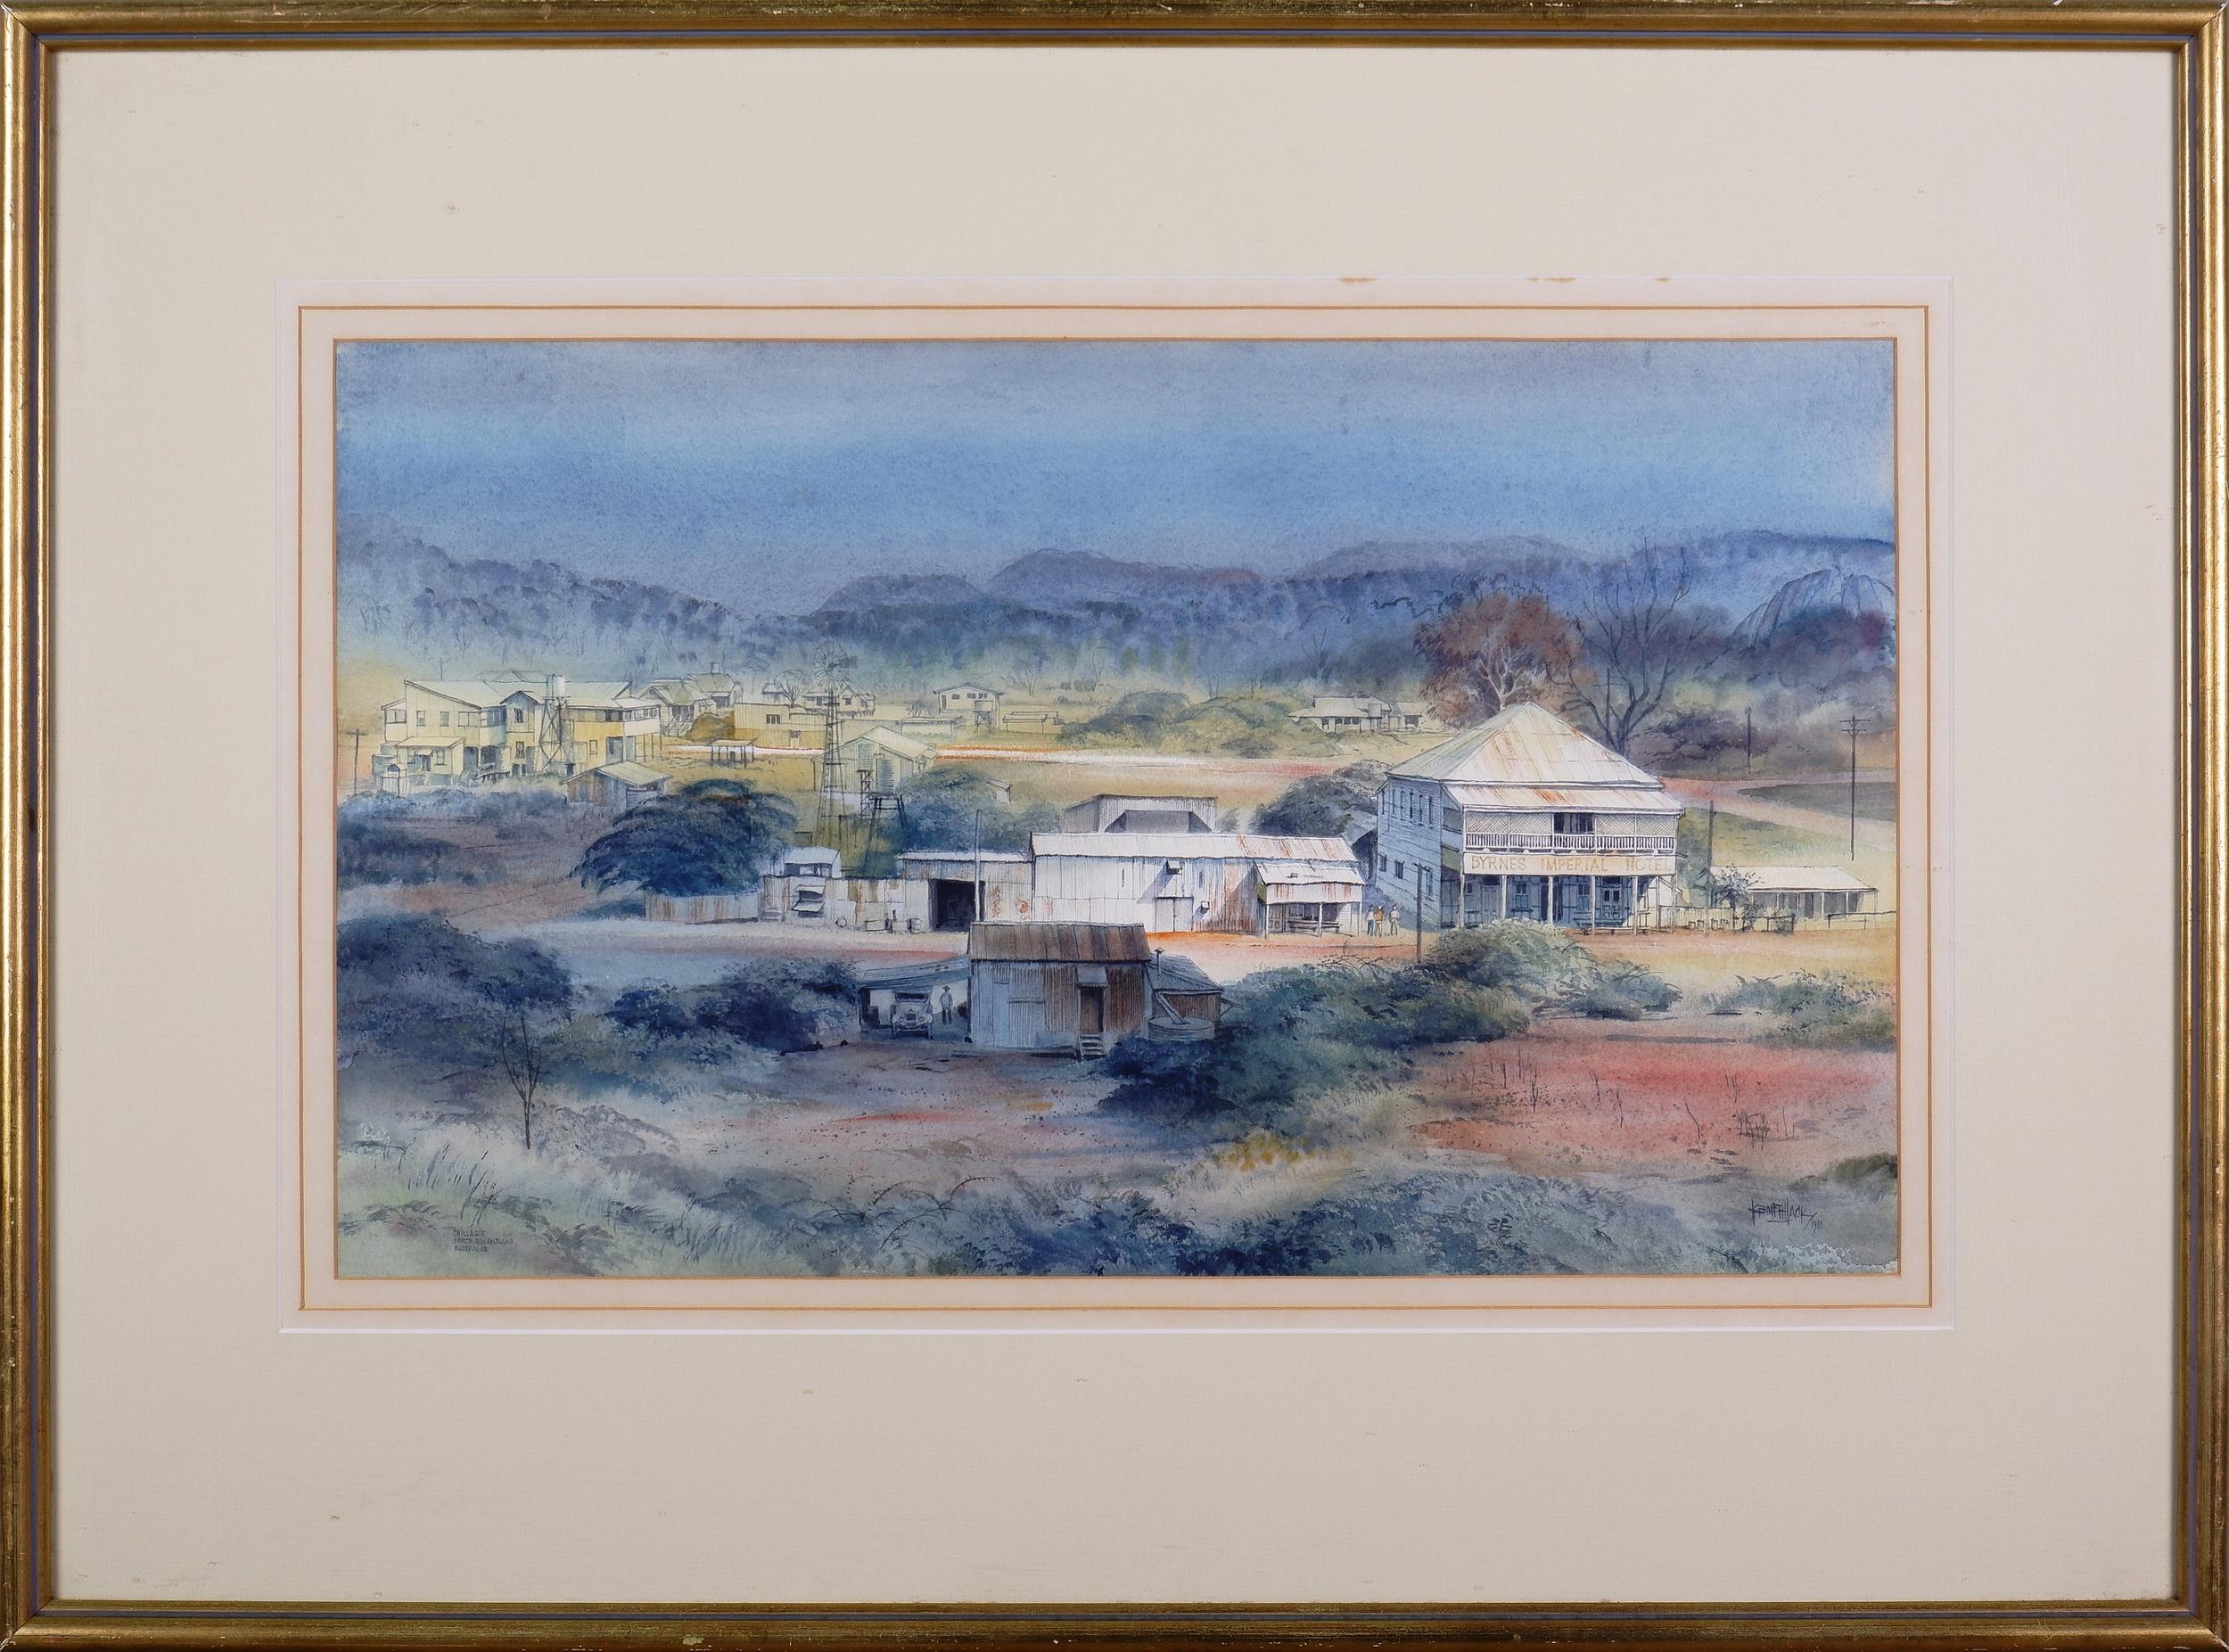 'Kenneth Jack (1924-2006), Chillagoe, North Queensland 1981, Watercolour'